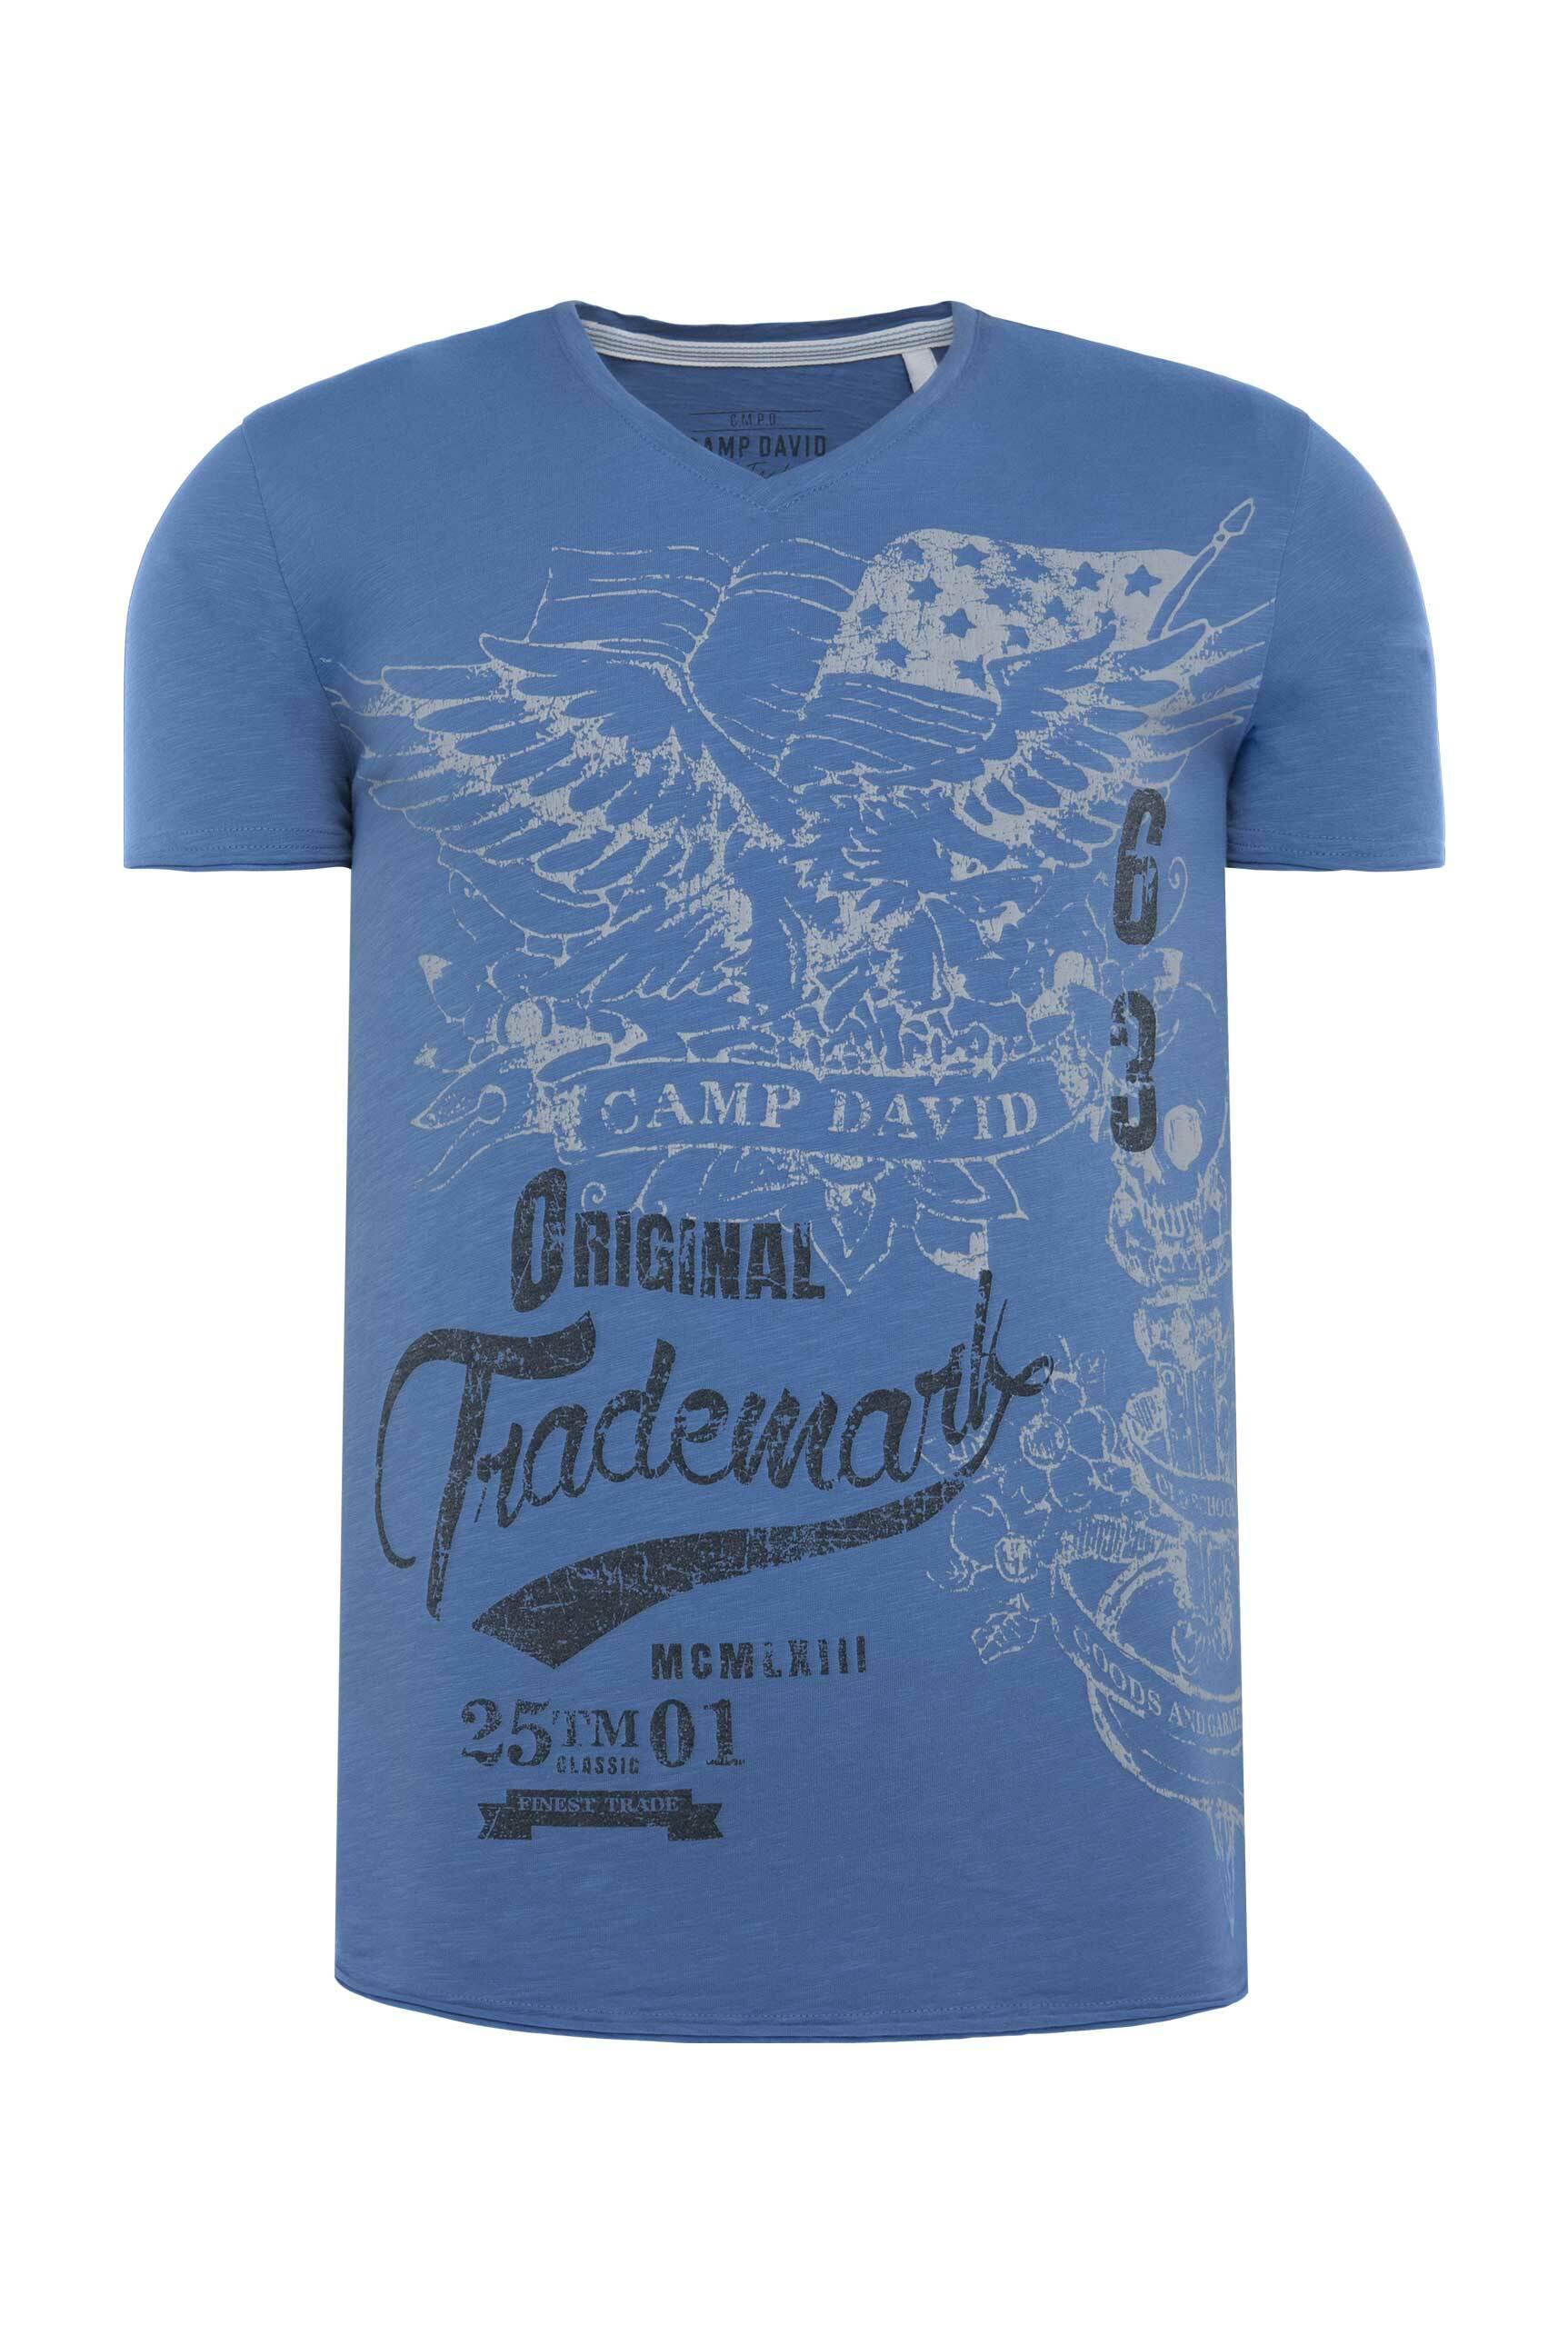 V-Shirt aus Slub Yarn mit Vintage Print